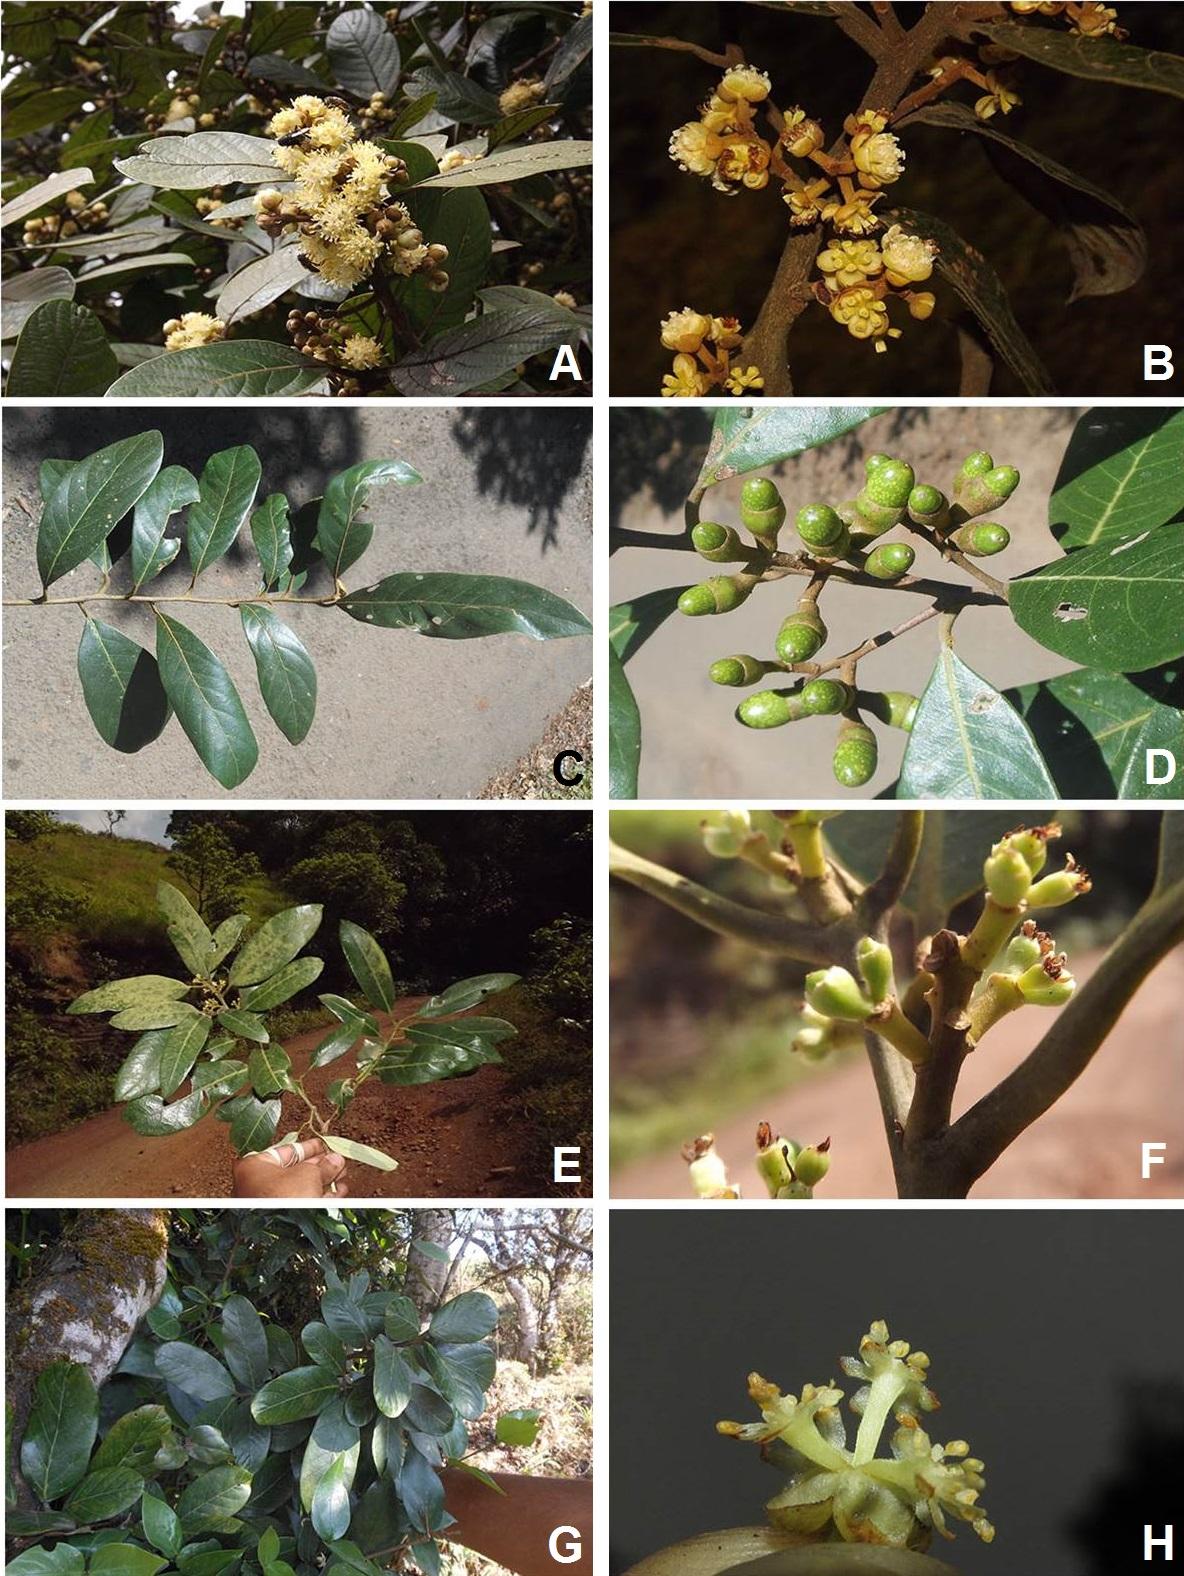 Litsea species in Chikkamagaluru district, Karnataka: A–B, Litsea floribunda; C–D, Litsea sotockssi; E–F, Litsea mysorensis; G–H, Litsea glabrata.